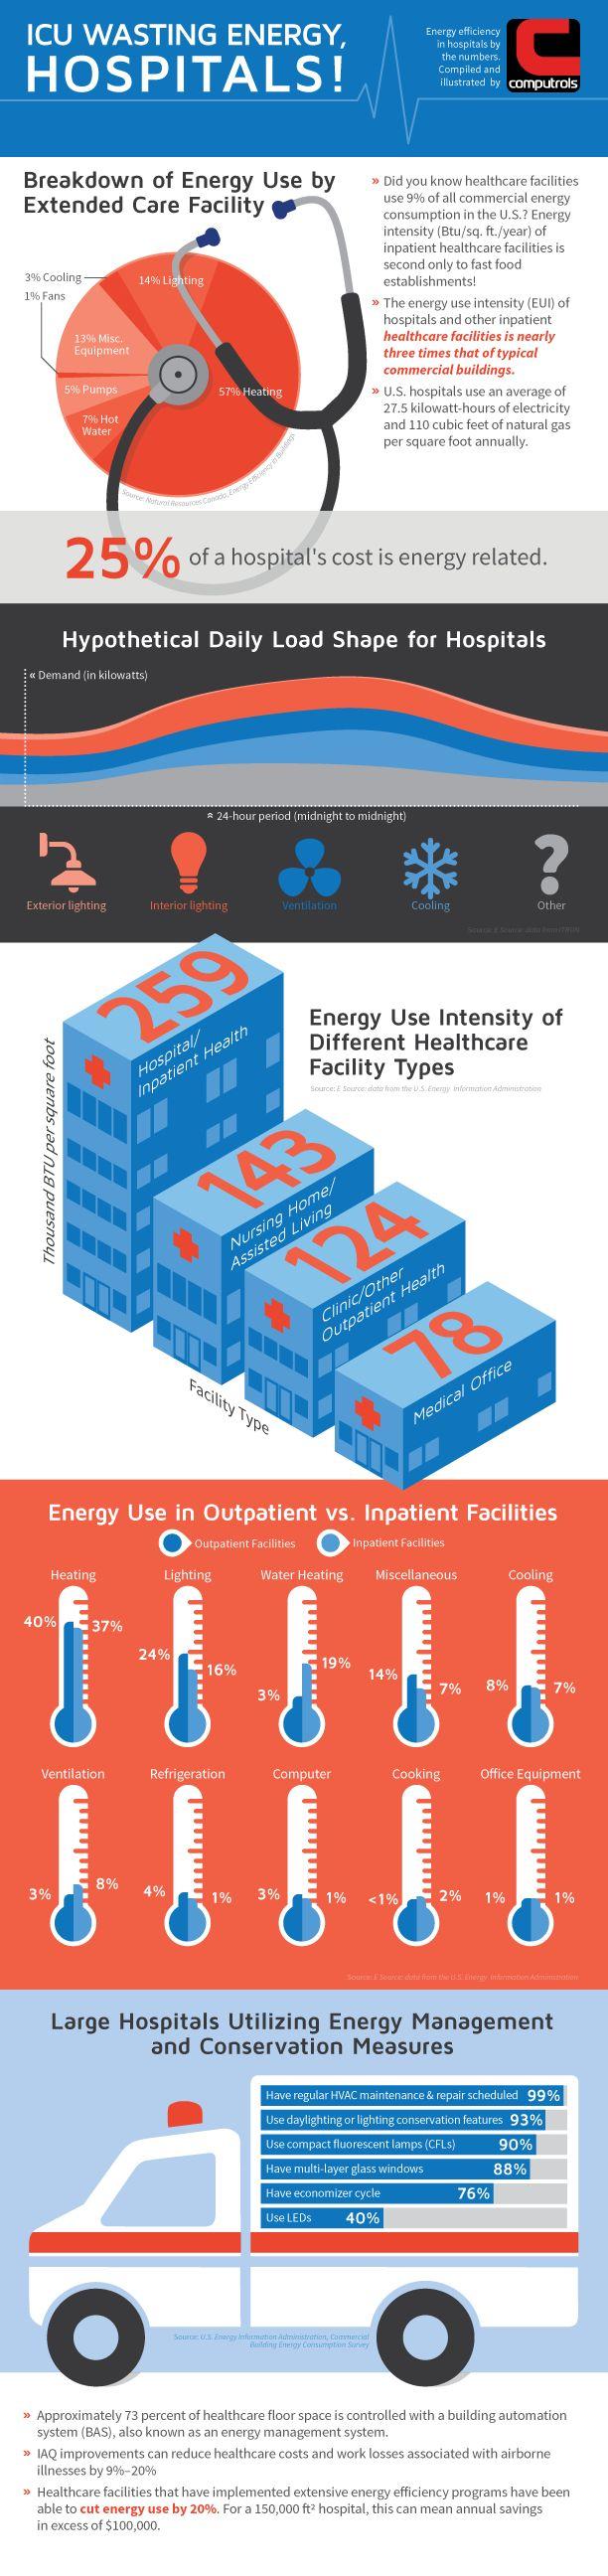 ICU Wasting Energy, Hospitals!